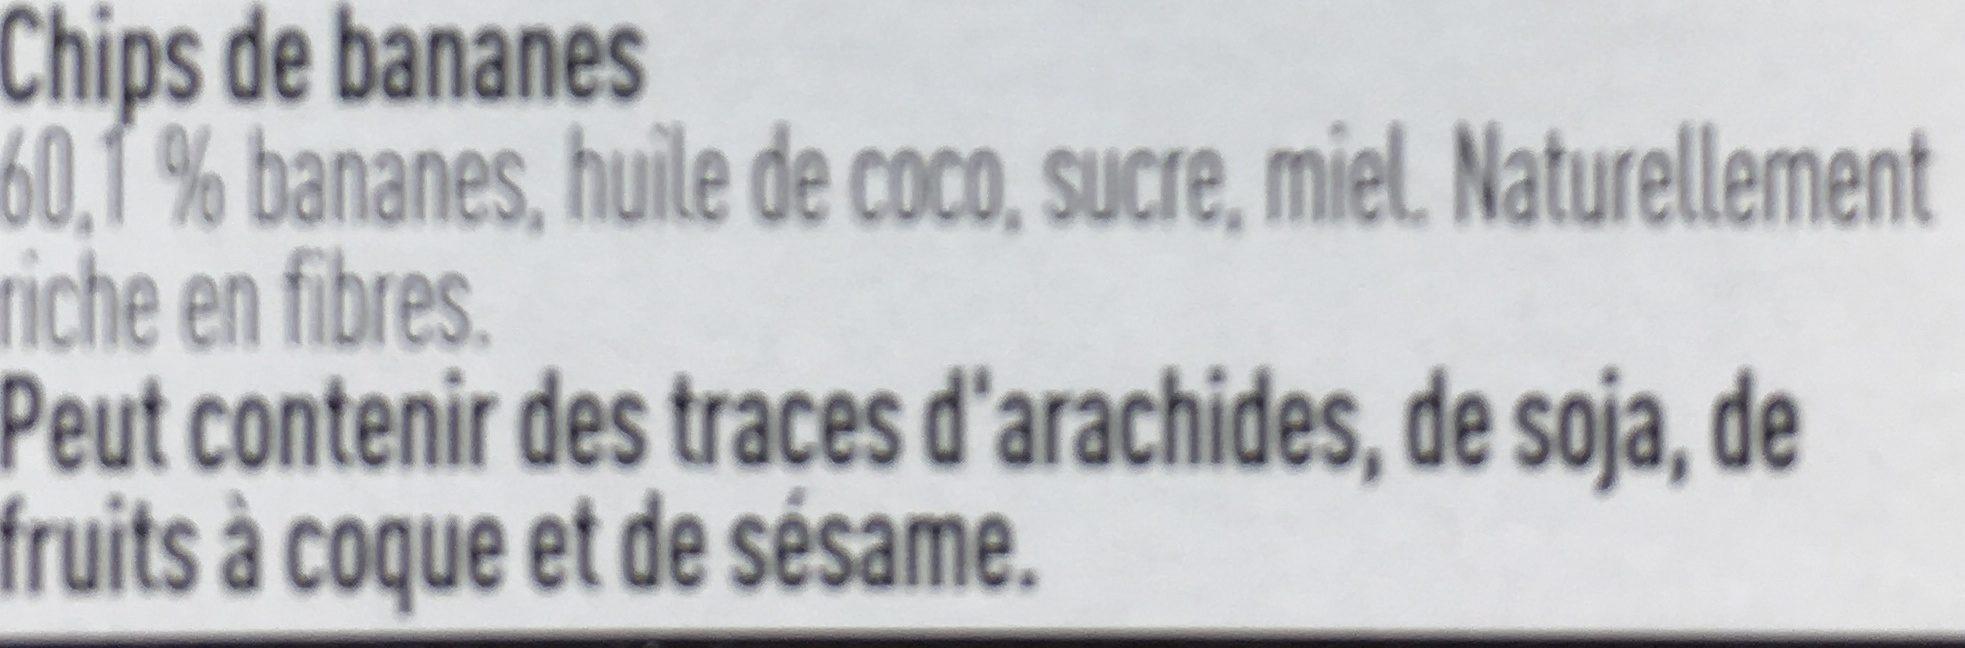 Chips de Bananes - Ingrediënten - fr